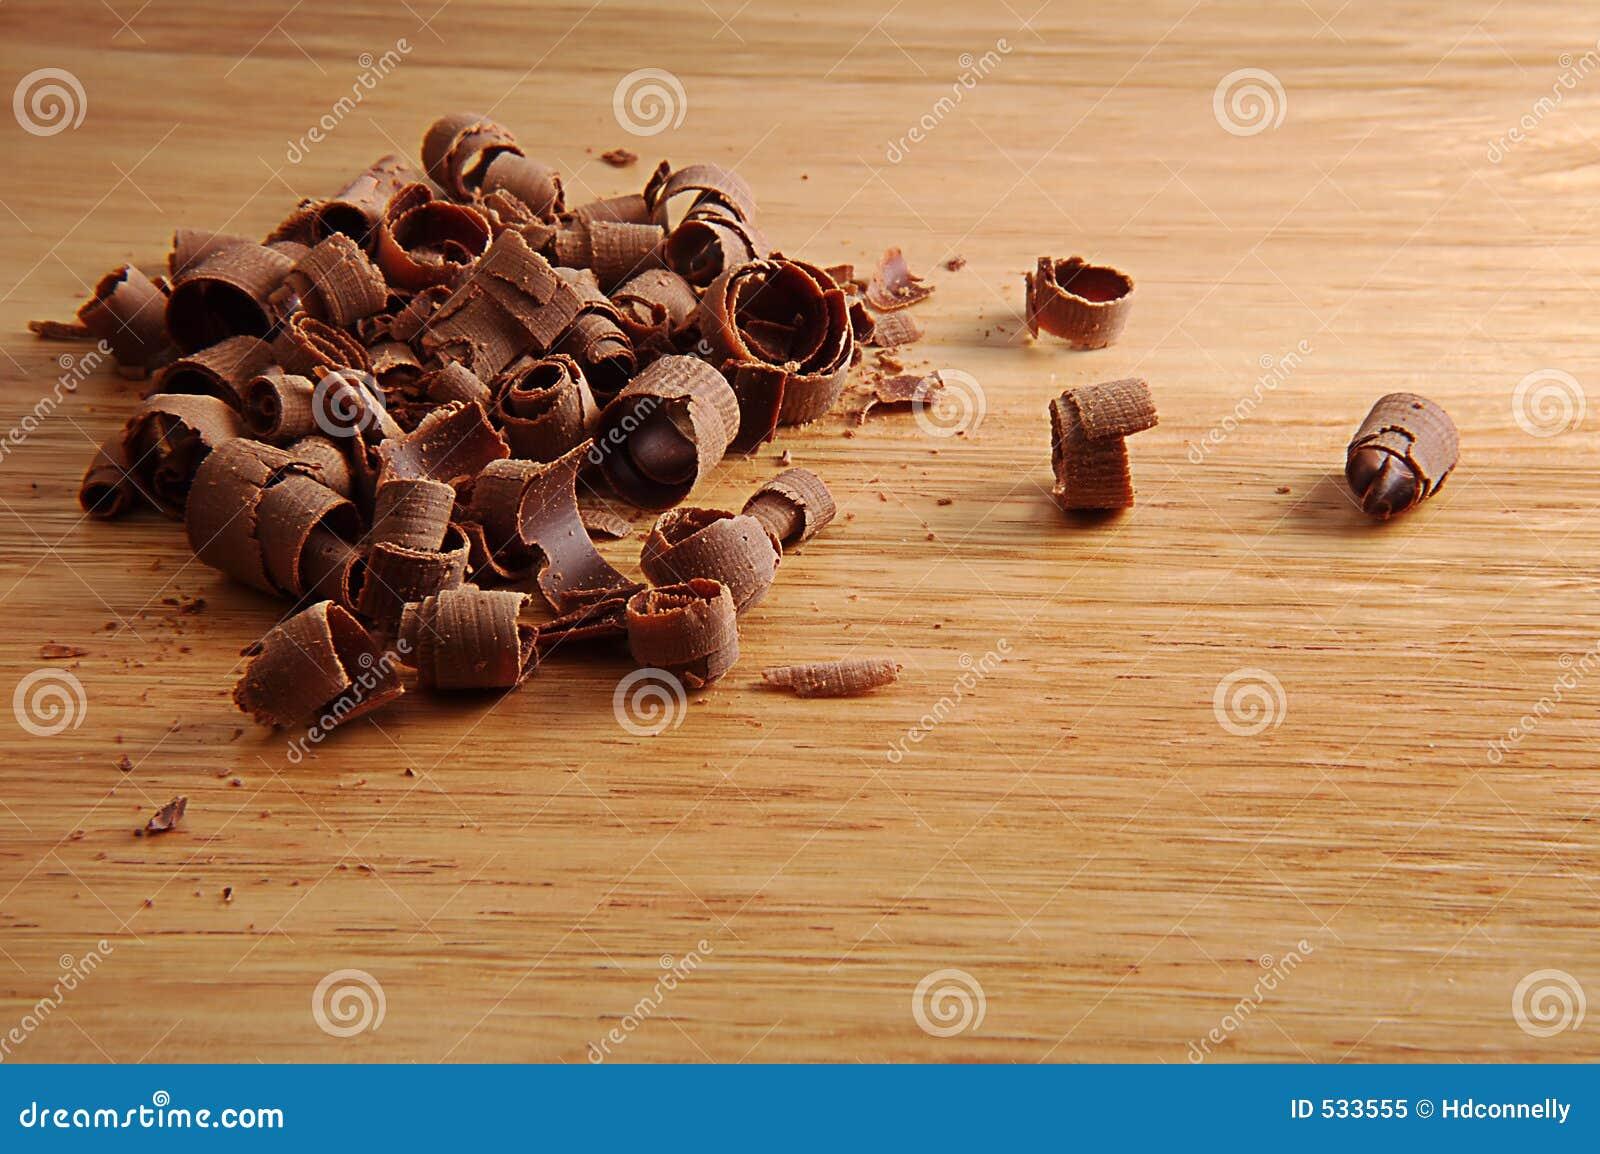 Chocolate mim